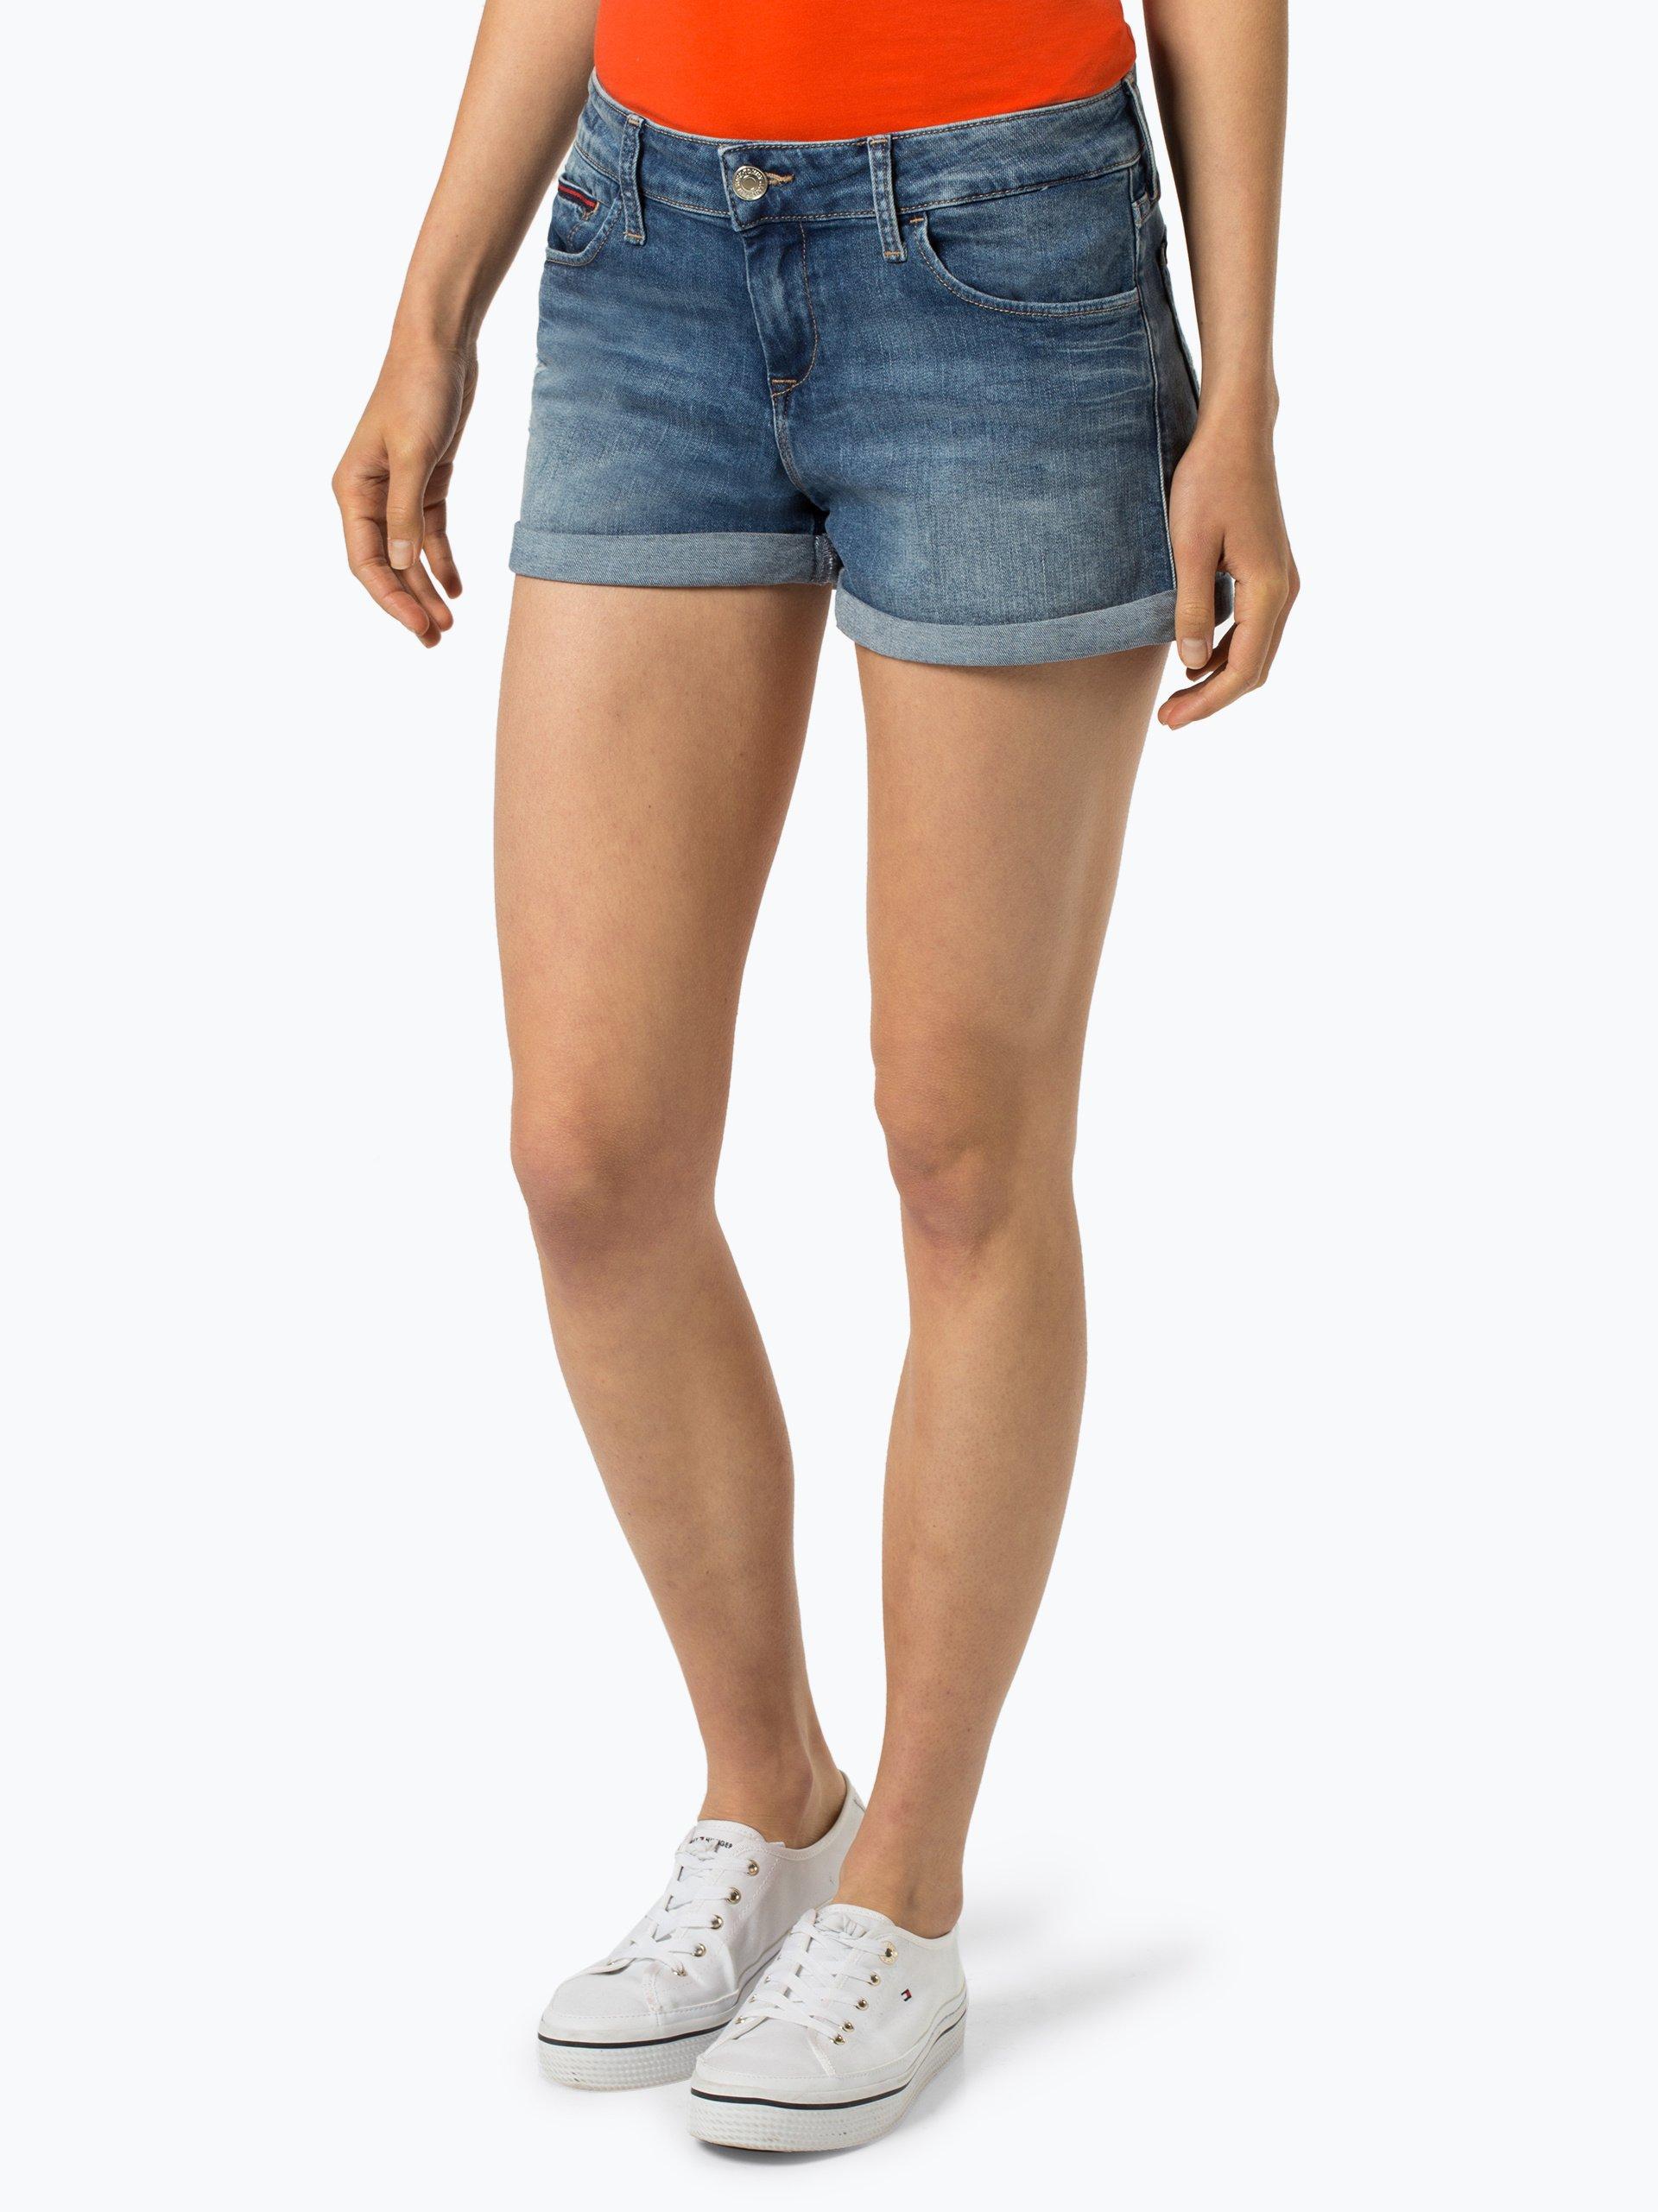 Tommy Jeans Damen Jeansshorts